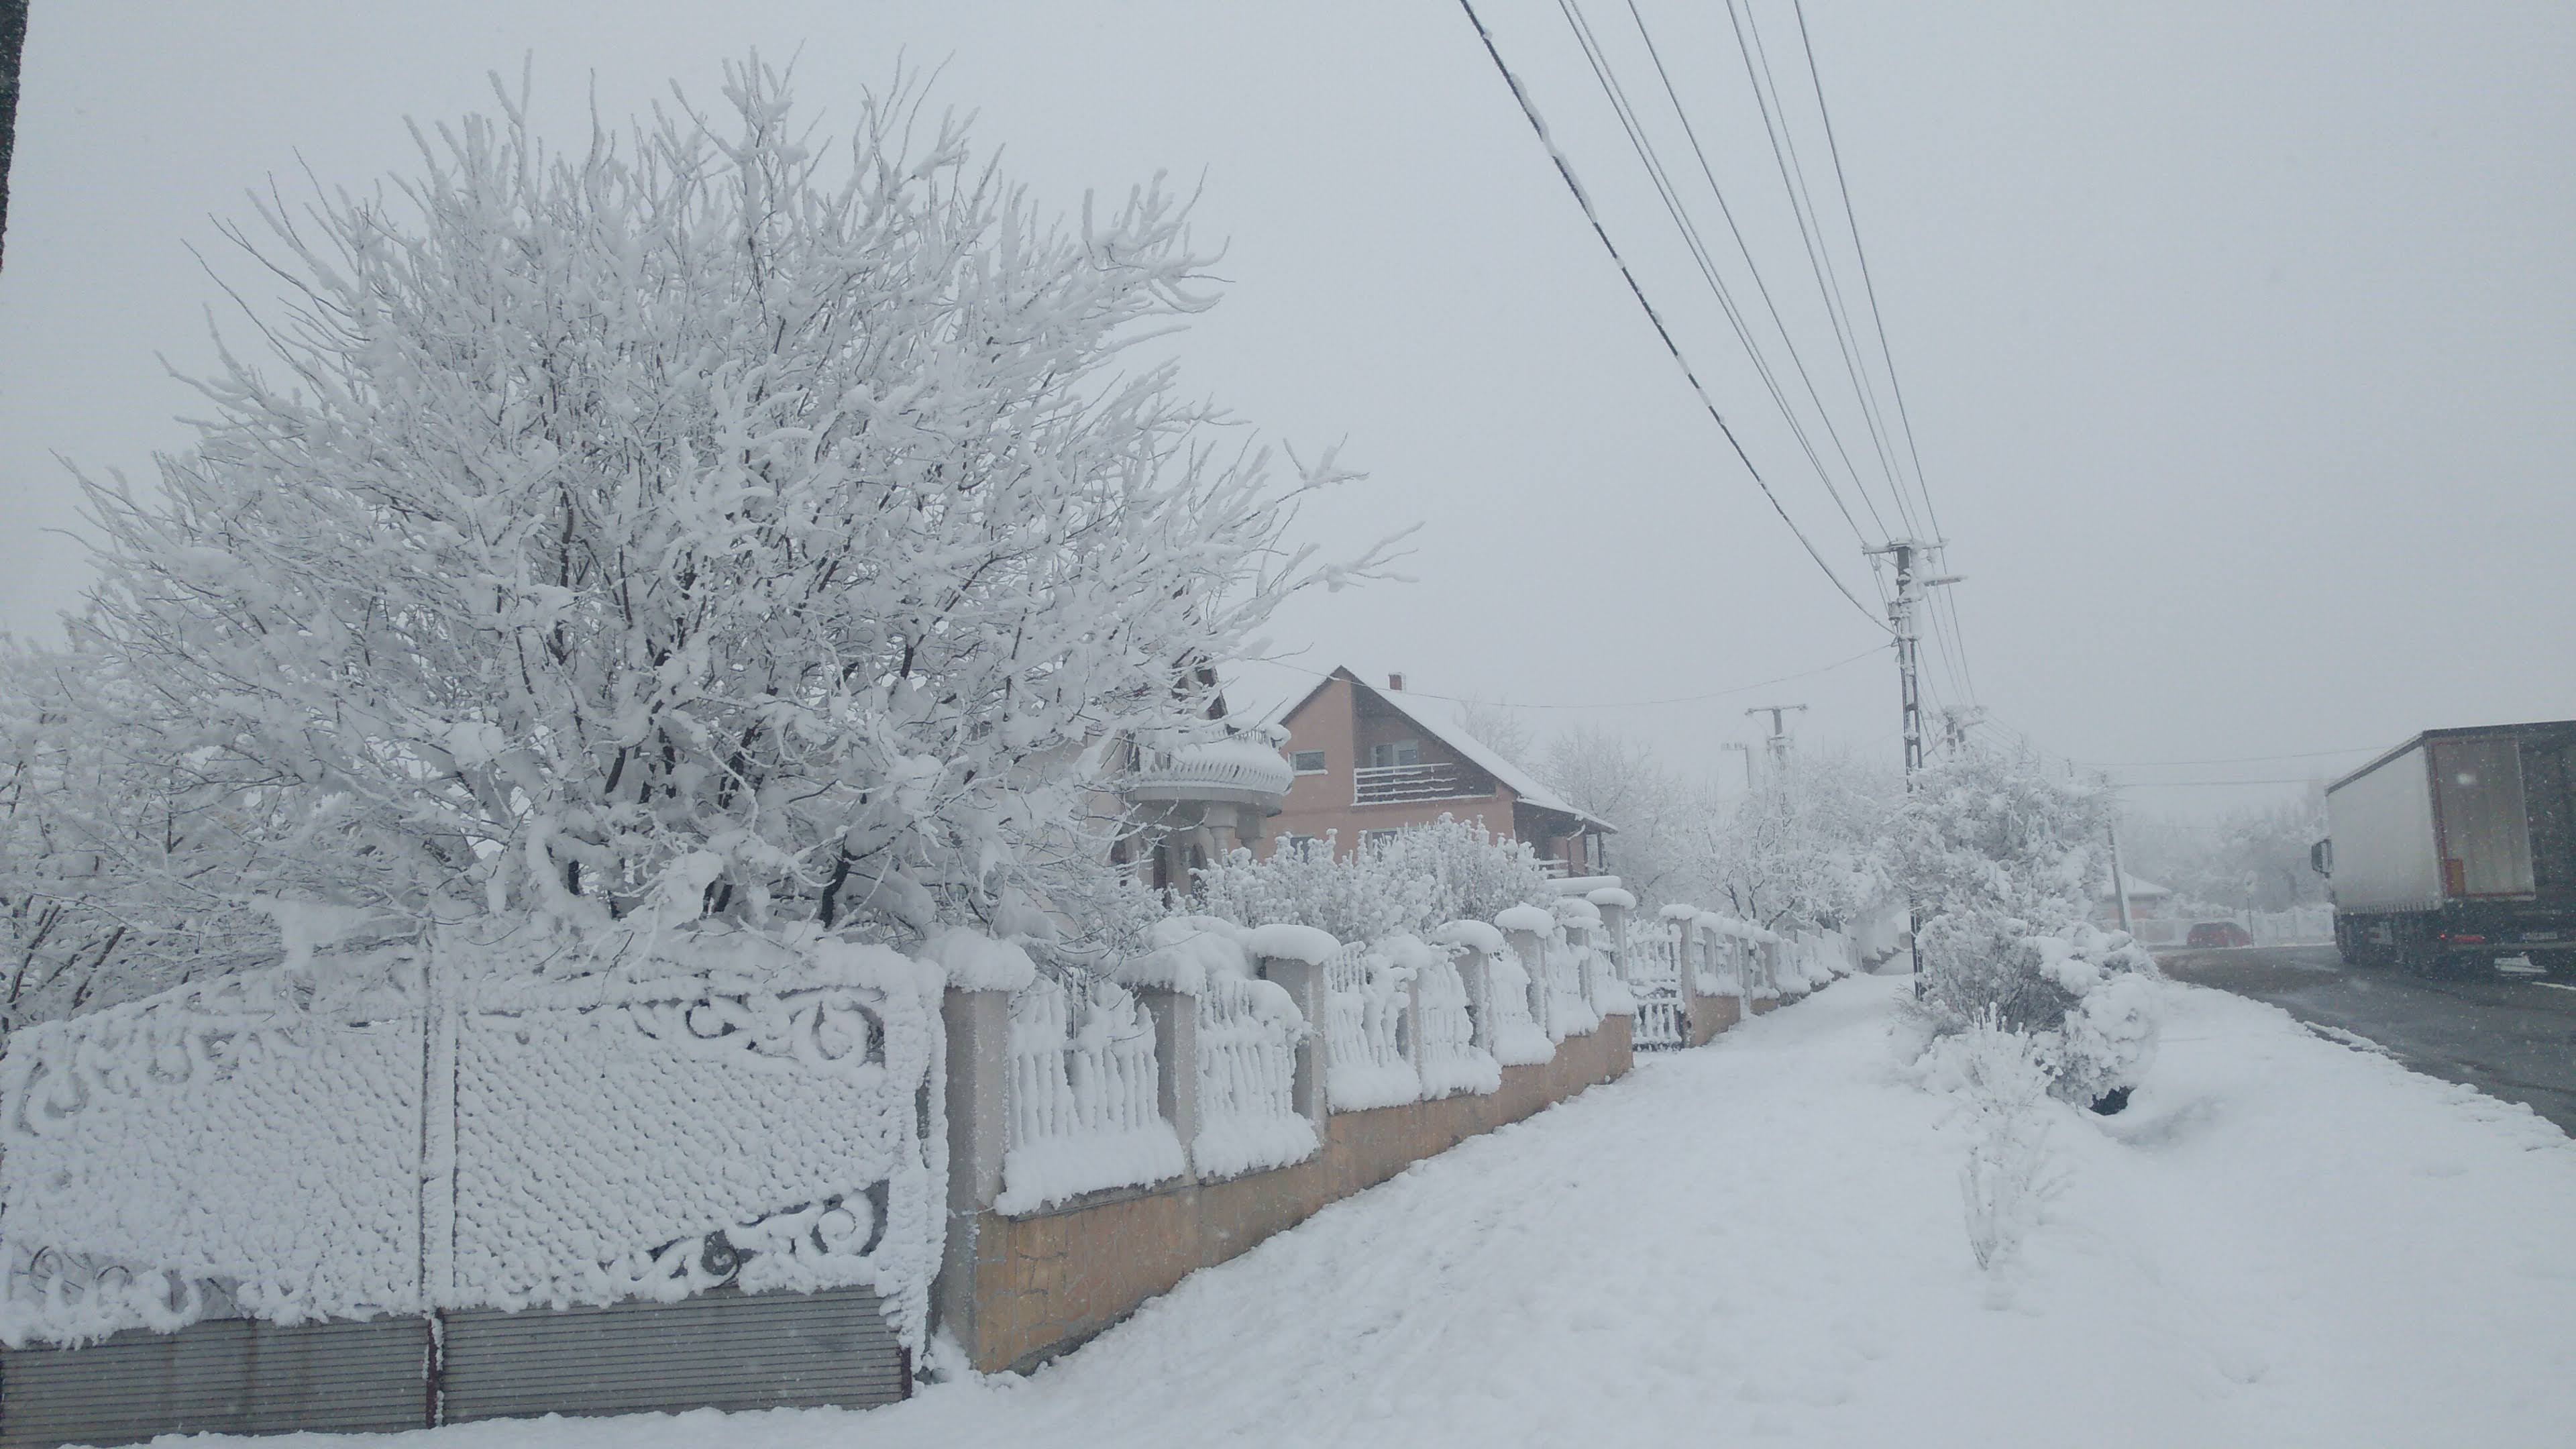 Olaszfalui hó Forrás: Síaréna